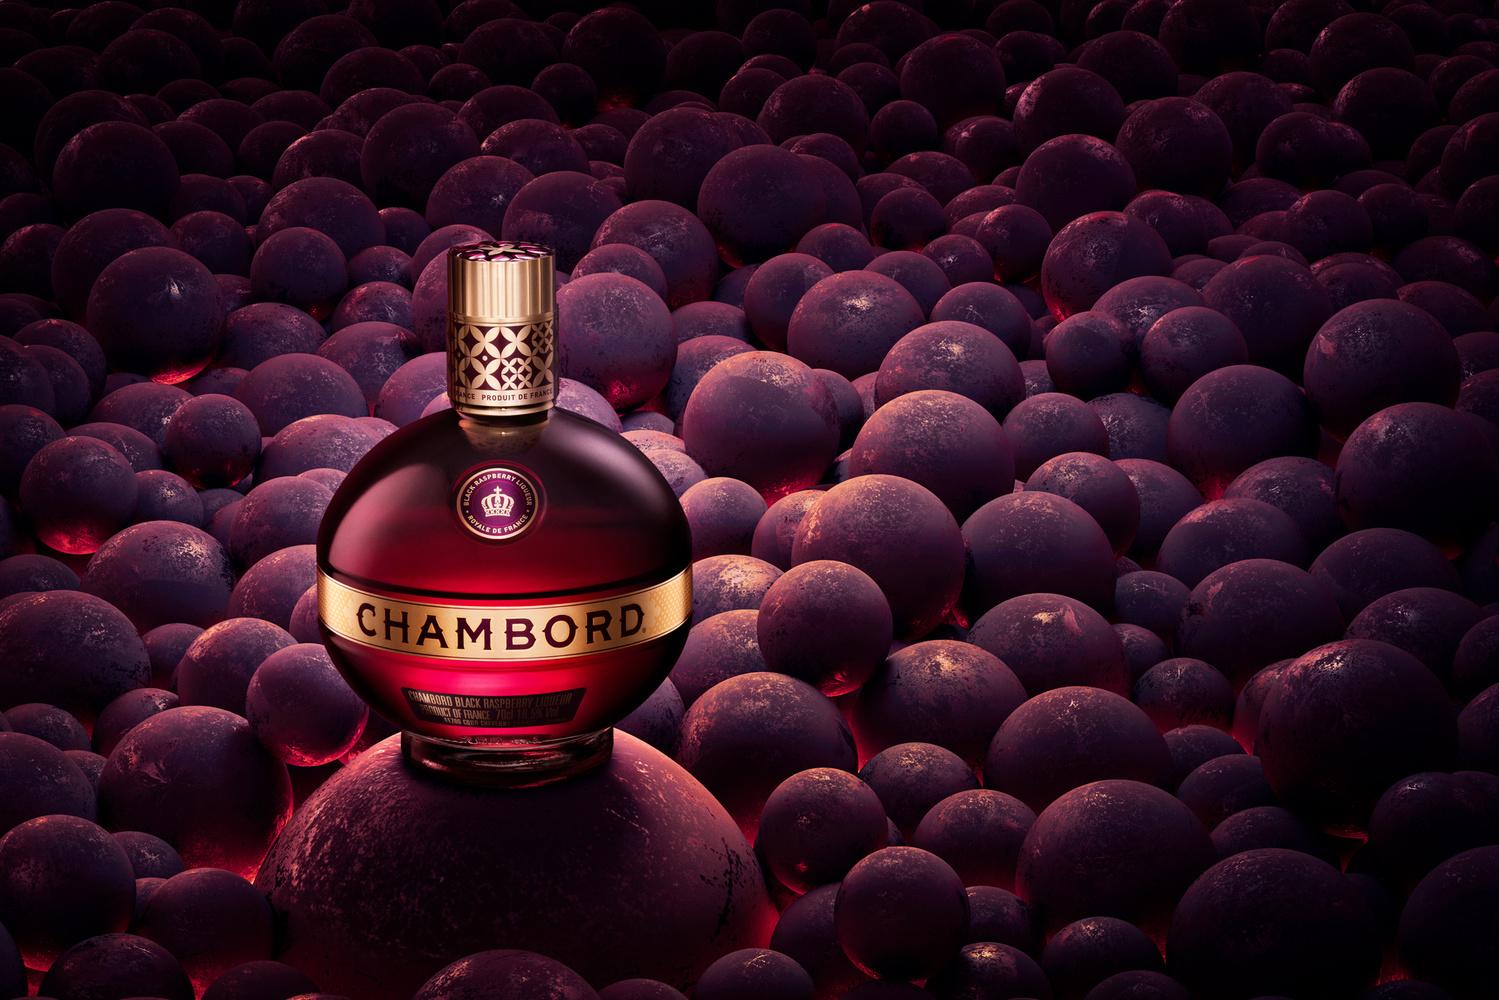 chambord liqueur by Piotr Maksymowicz